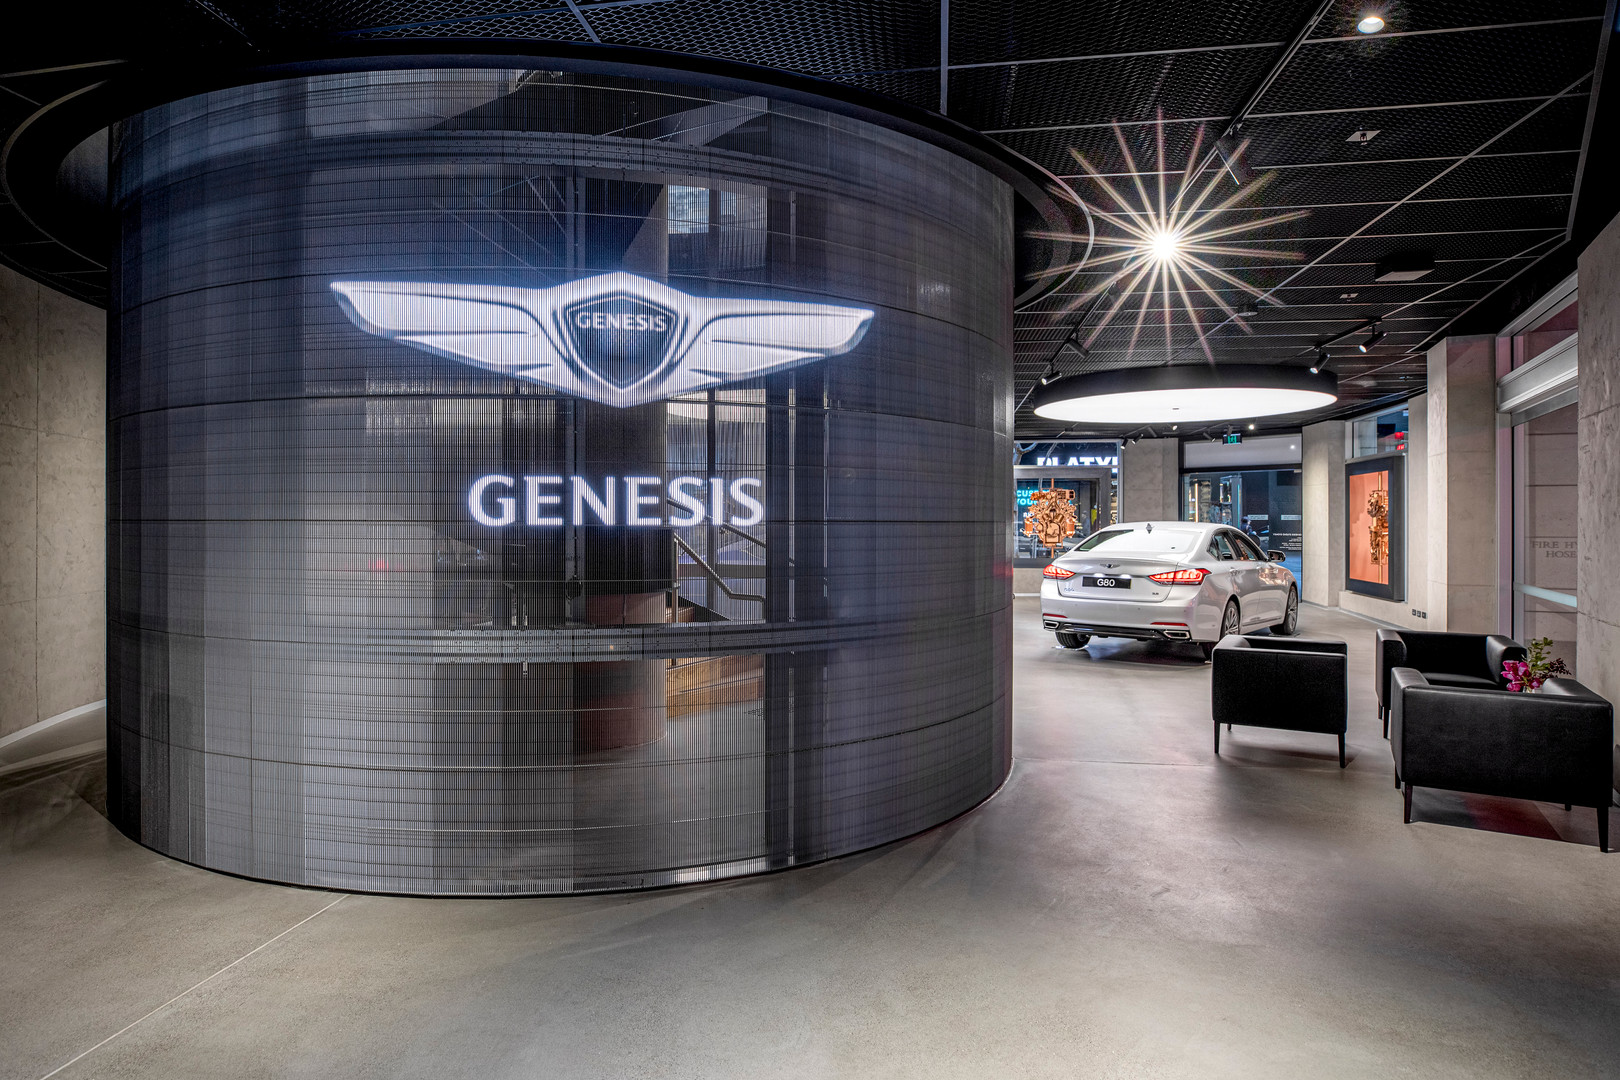 Genesis Studio Sydney © Salty Dingo 2019